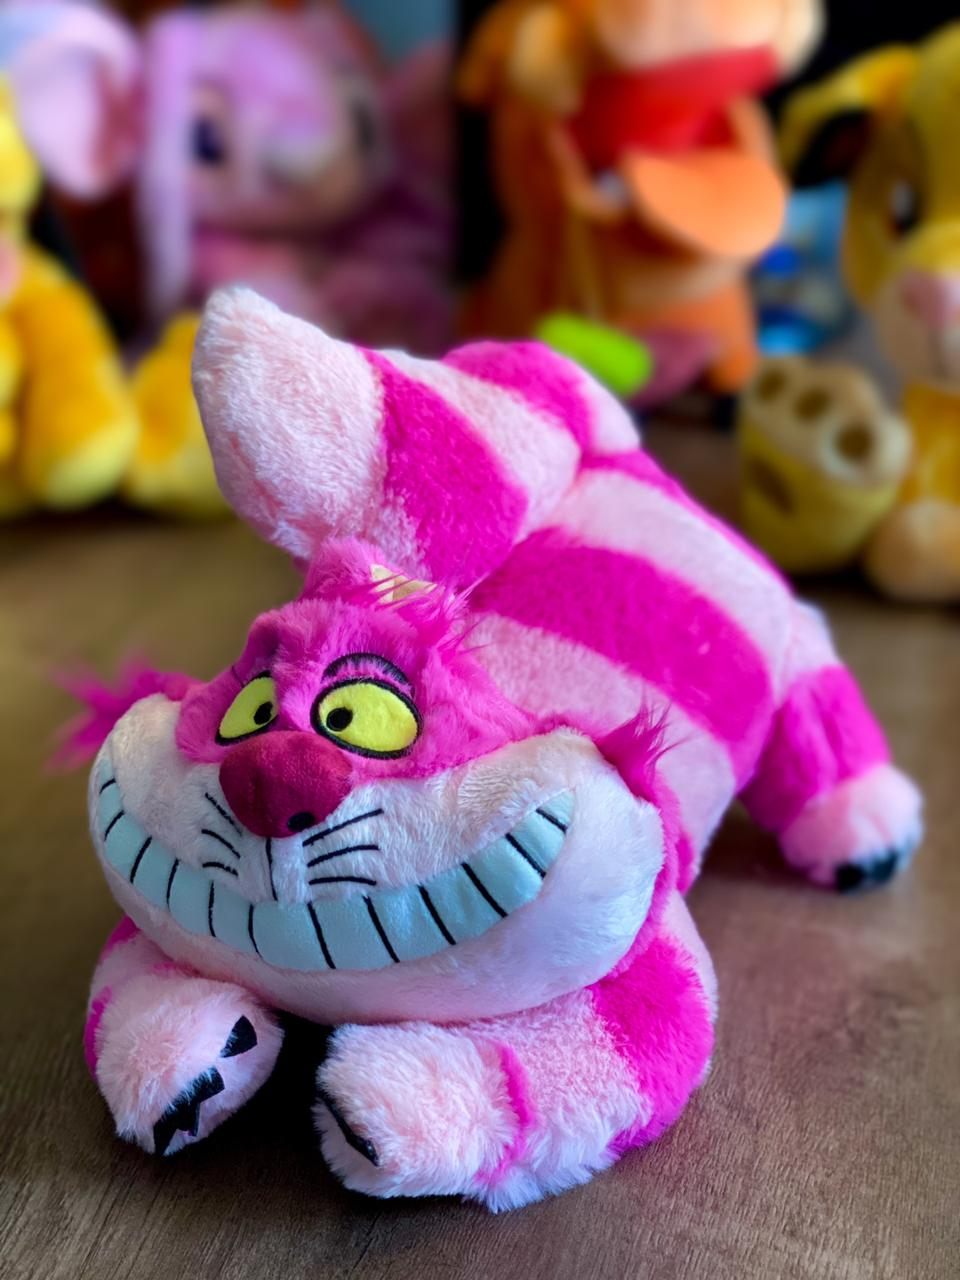 Pelúcia Gato Risonho: Alice no País das Maravilhas (Alice in Wonderland) Disney - FUN